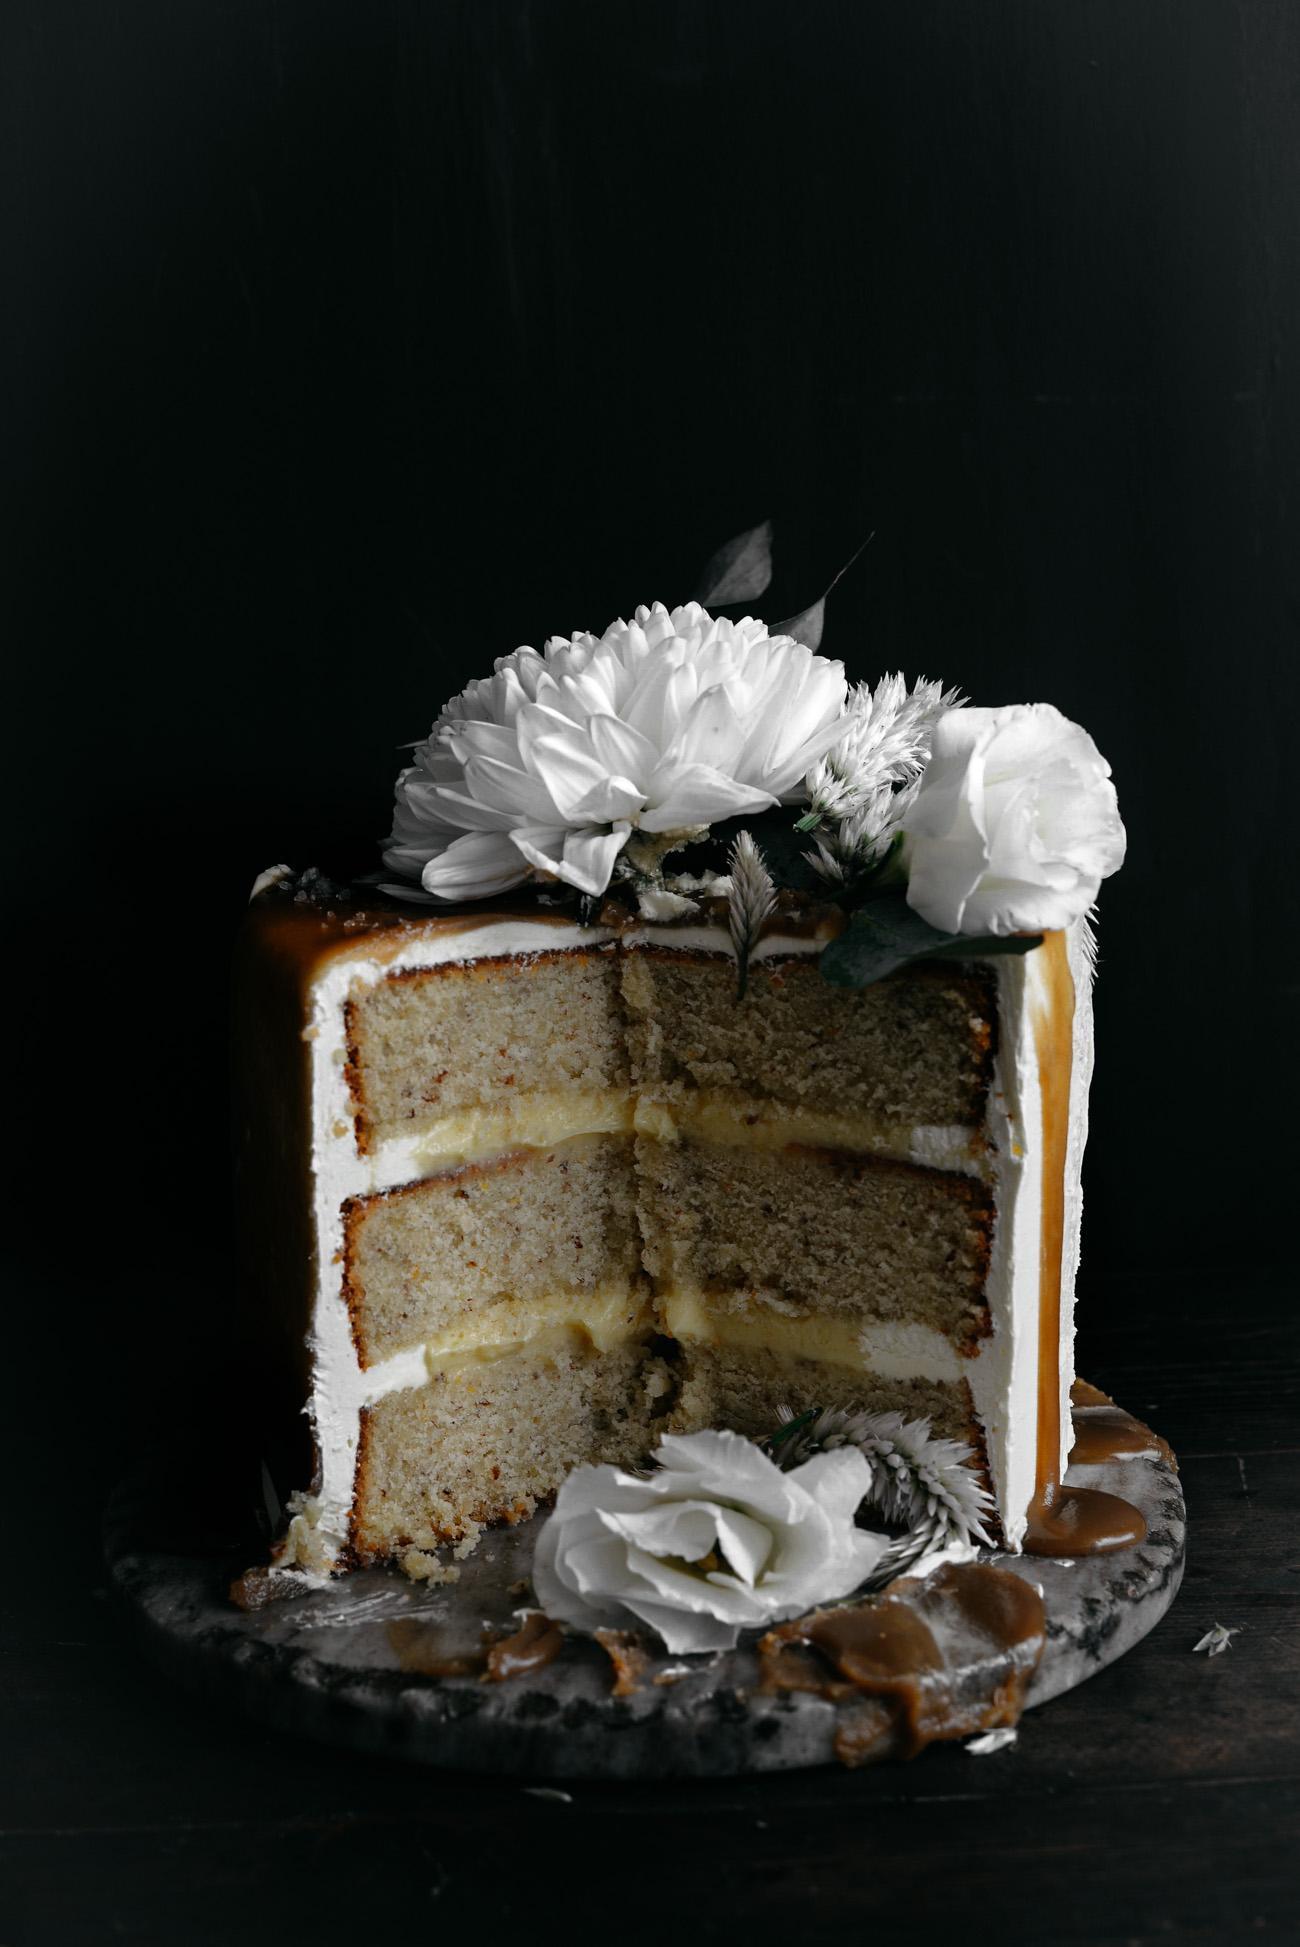 Italian-Orange-Blossom-and-Almond-Cake-with-Orange-Curd-Mascarpone-Swiss-Meringue-Buttercream-and-Fleur-d'Oranger-Caramel-6.jpg